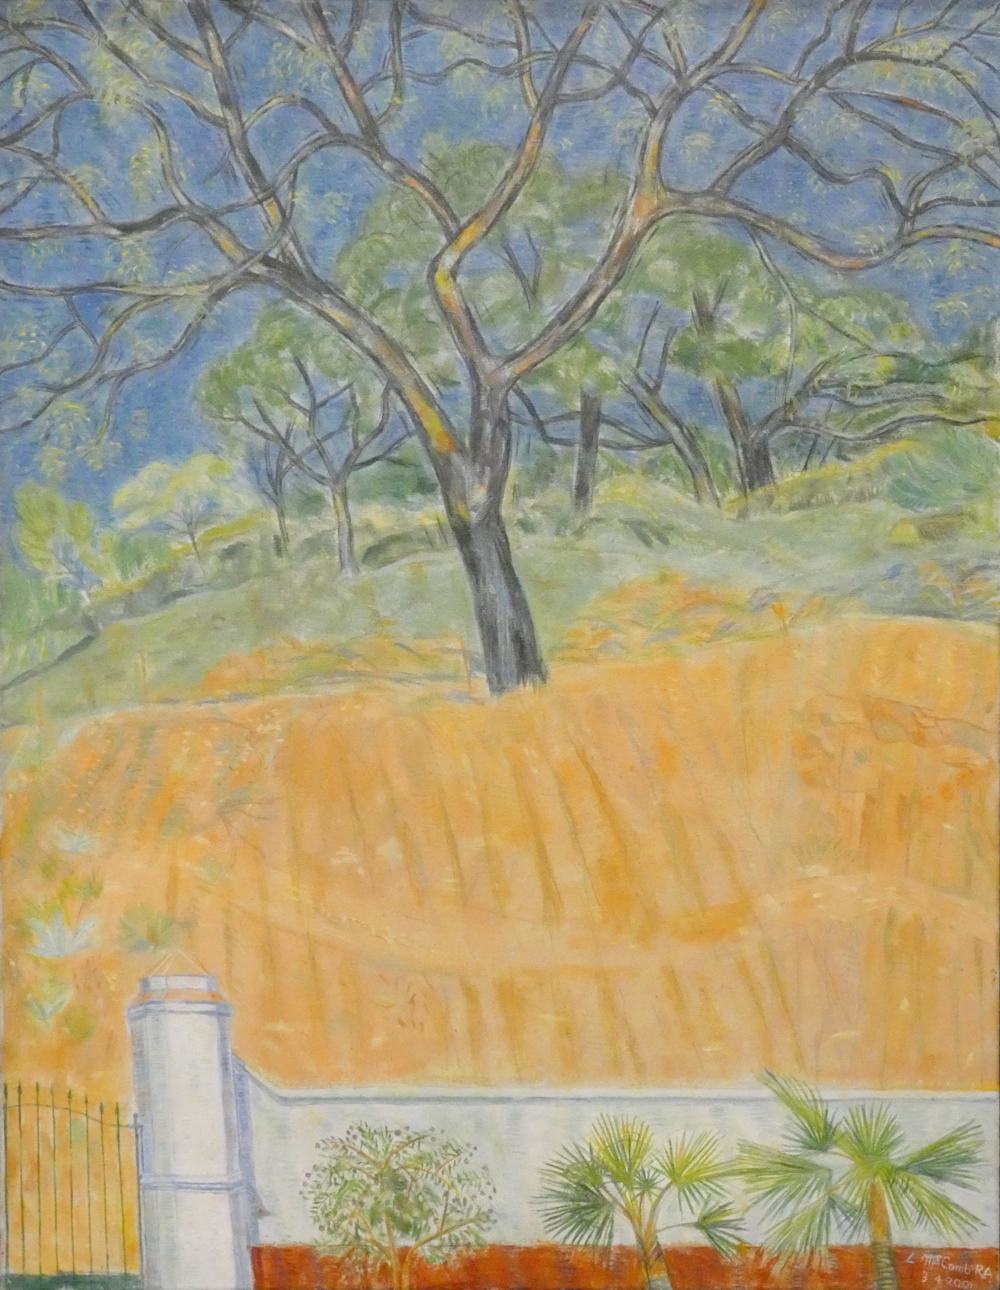 Leonard McComb_Garden in Malaga (2).png